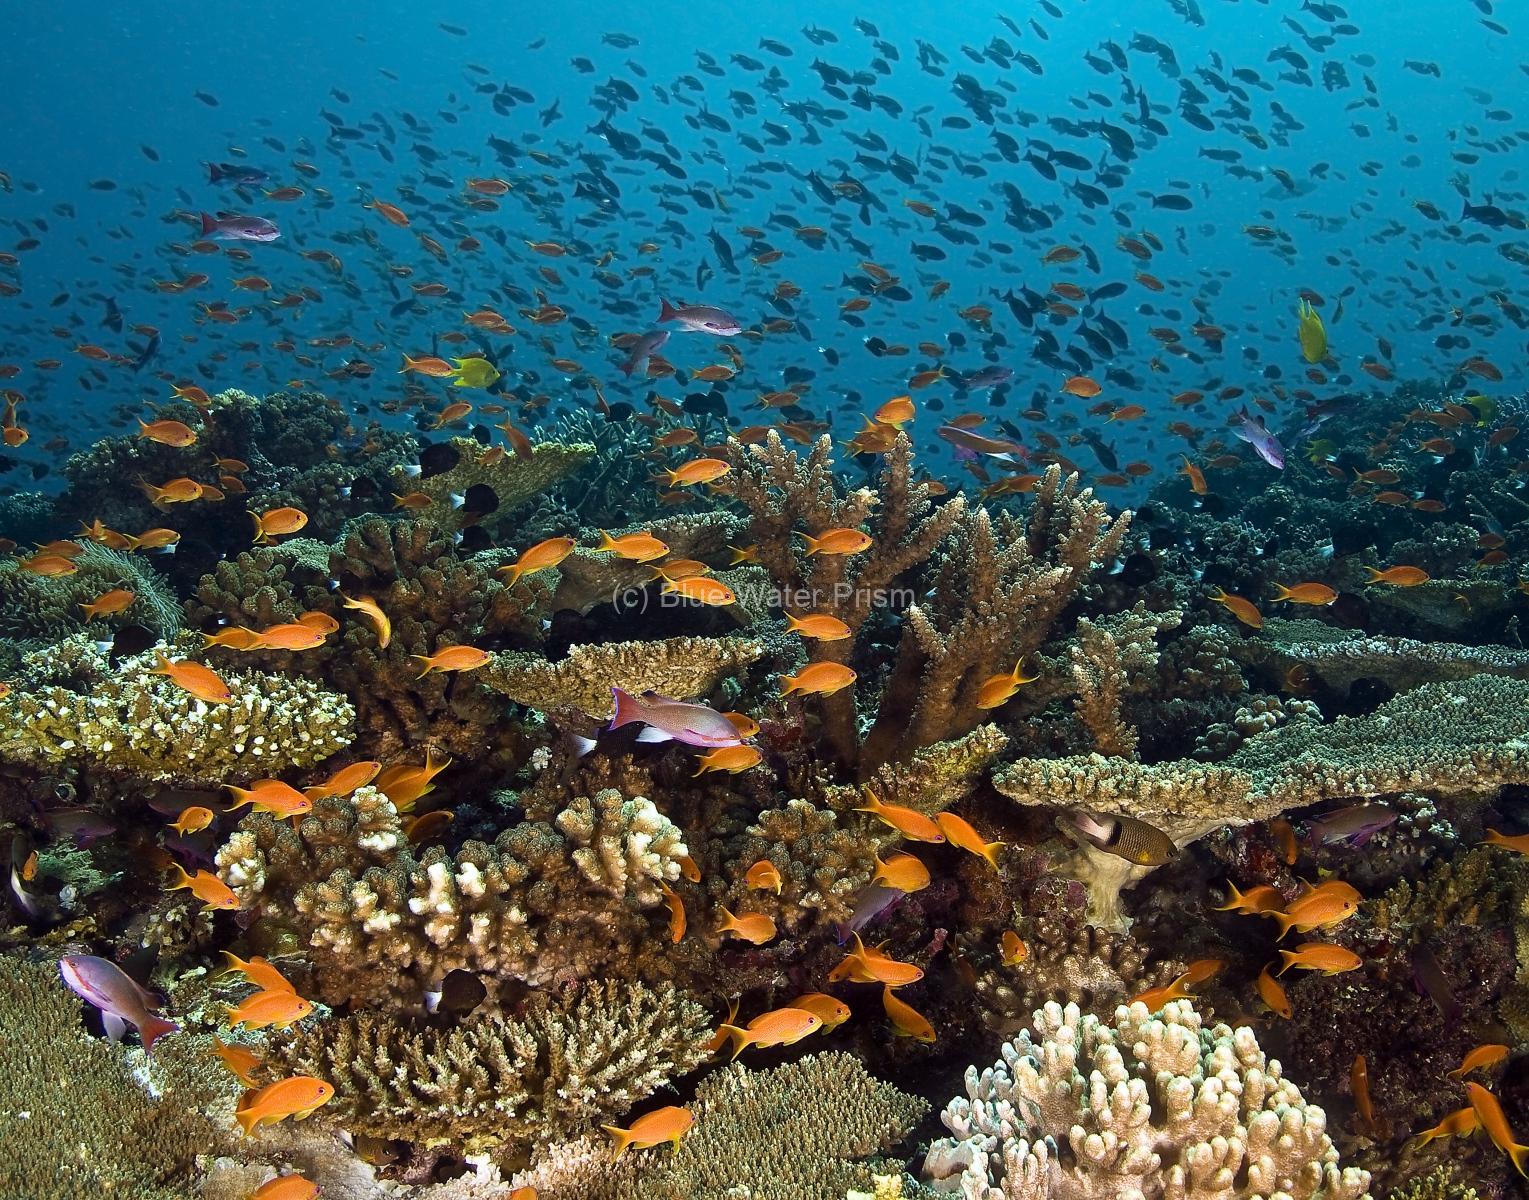 Fish Schooling on Reef in Fiji